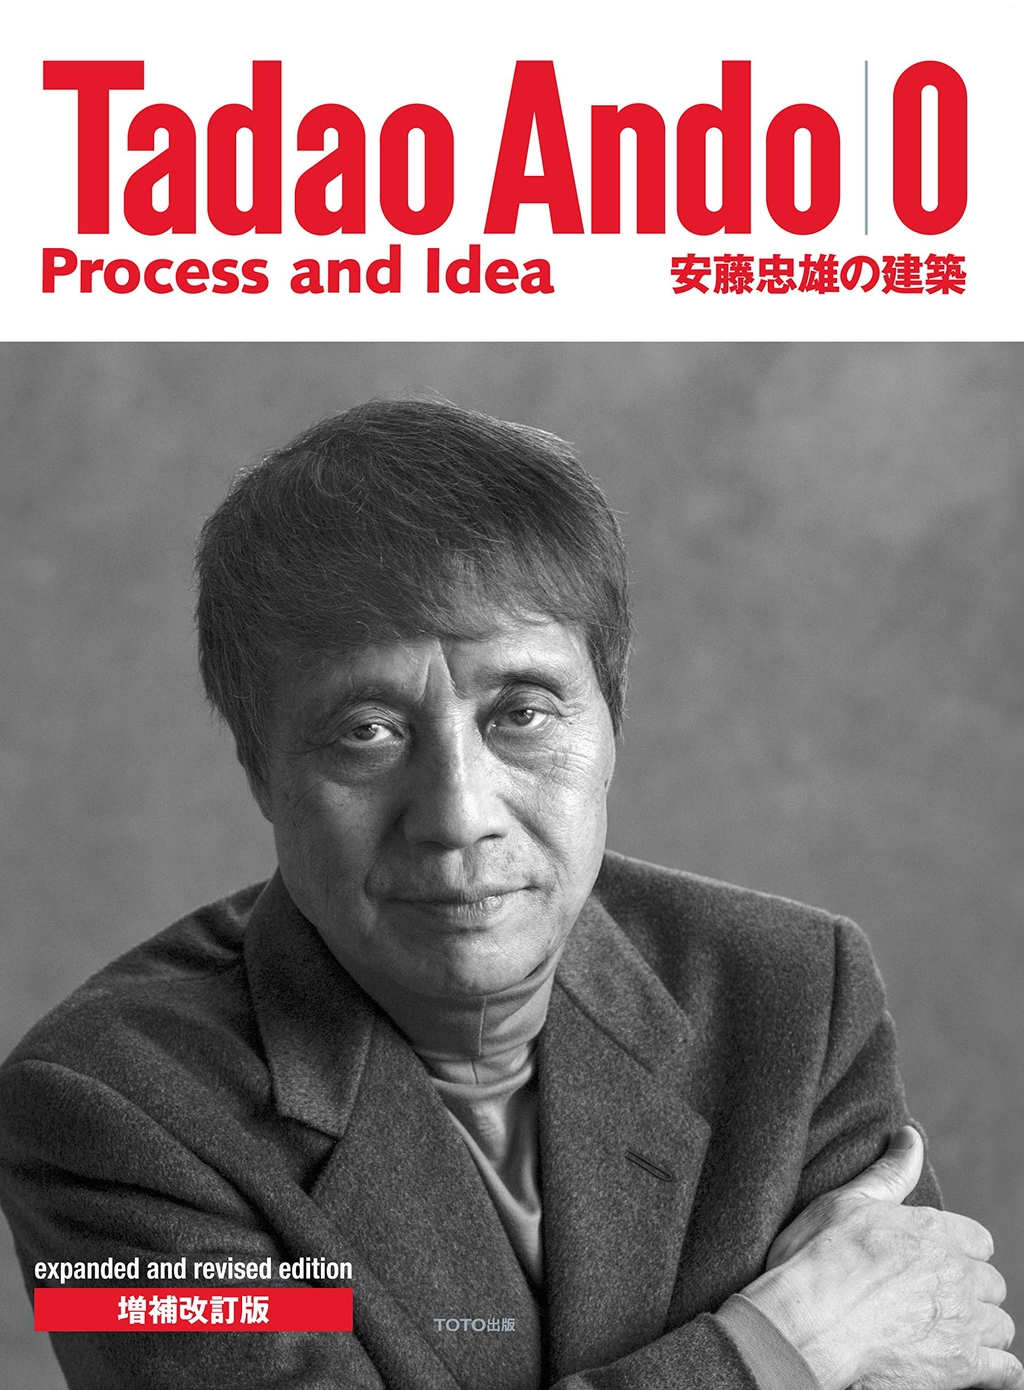 TADAO ANDO : PROCESS & IDEA